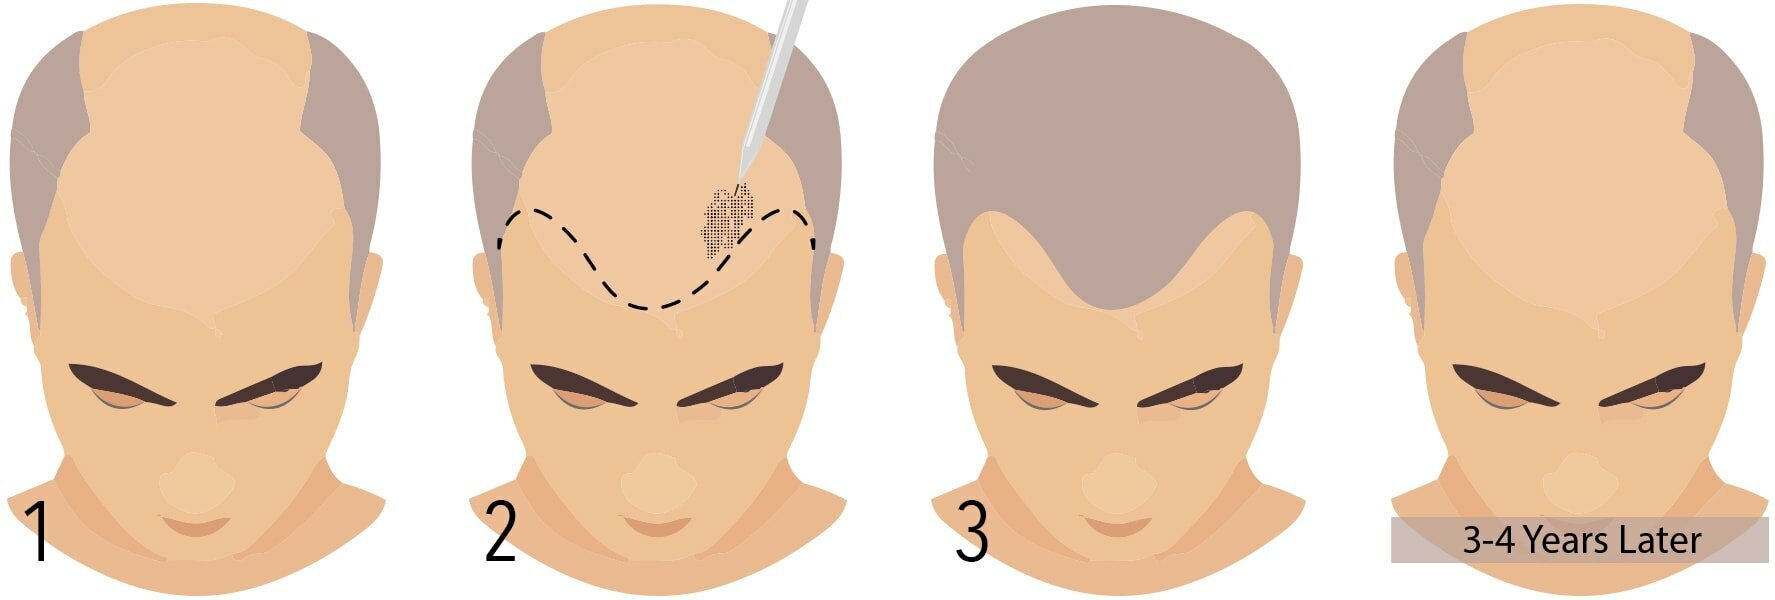 sac similasyonu-mikropigmentasyon